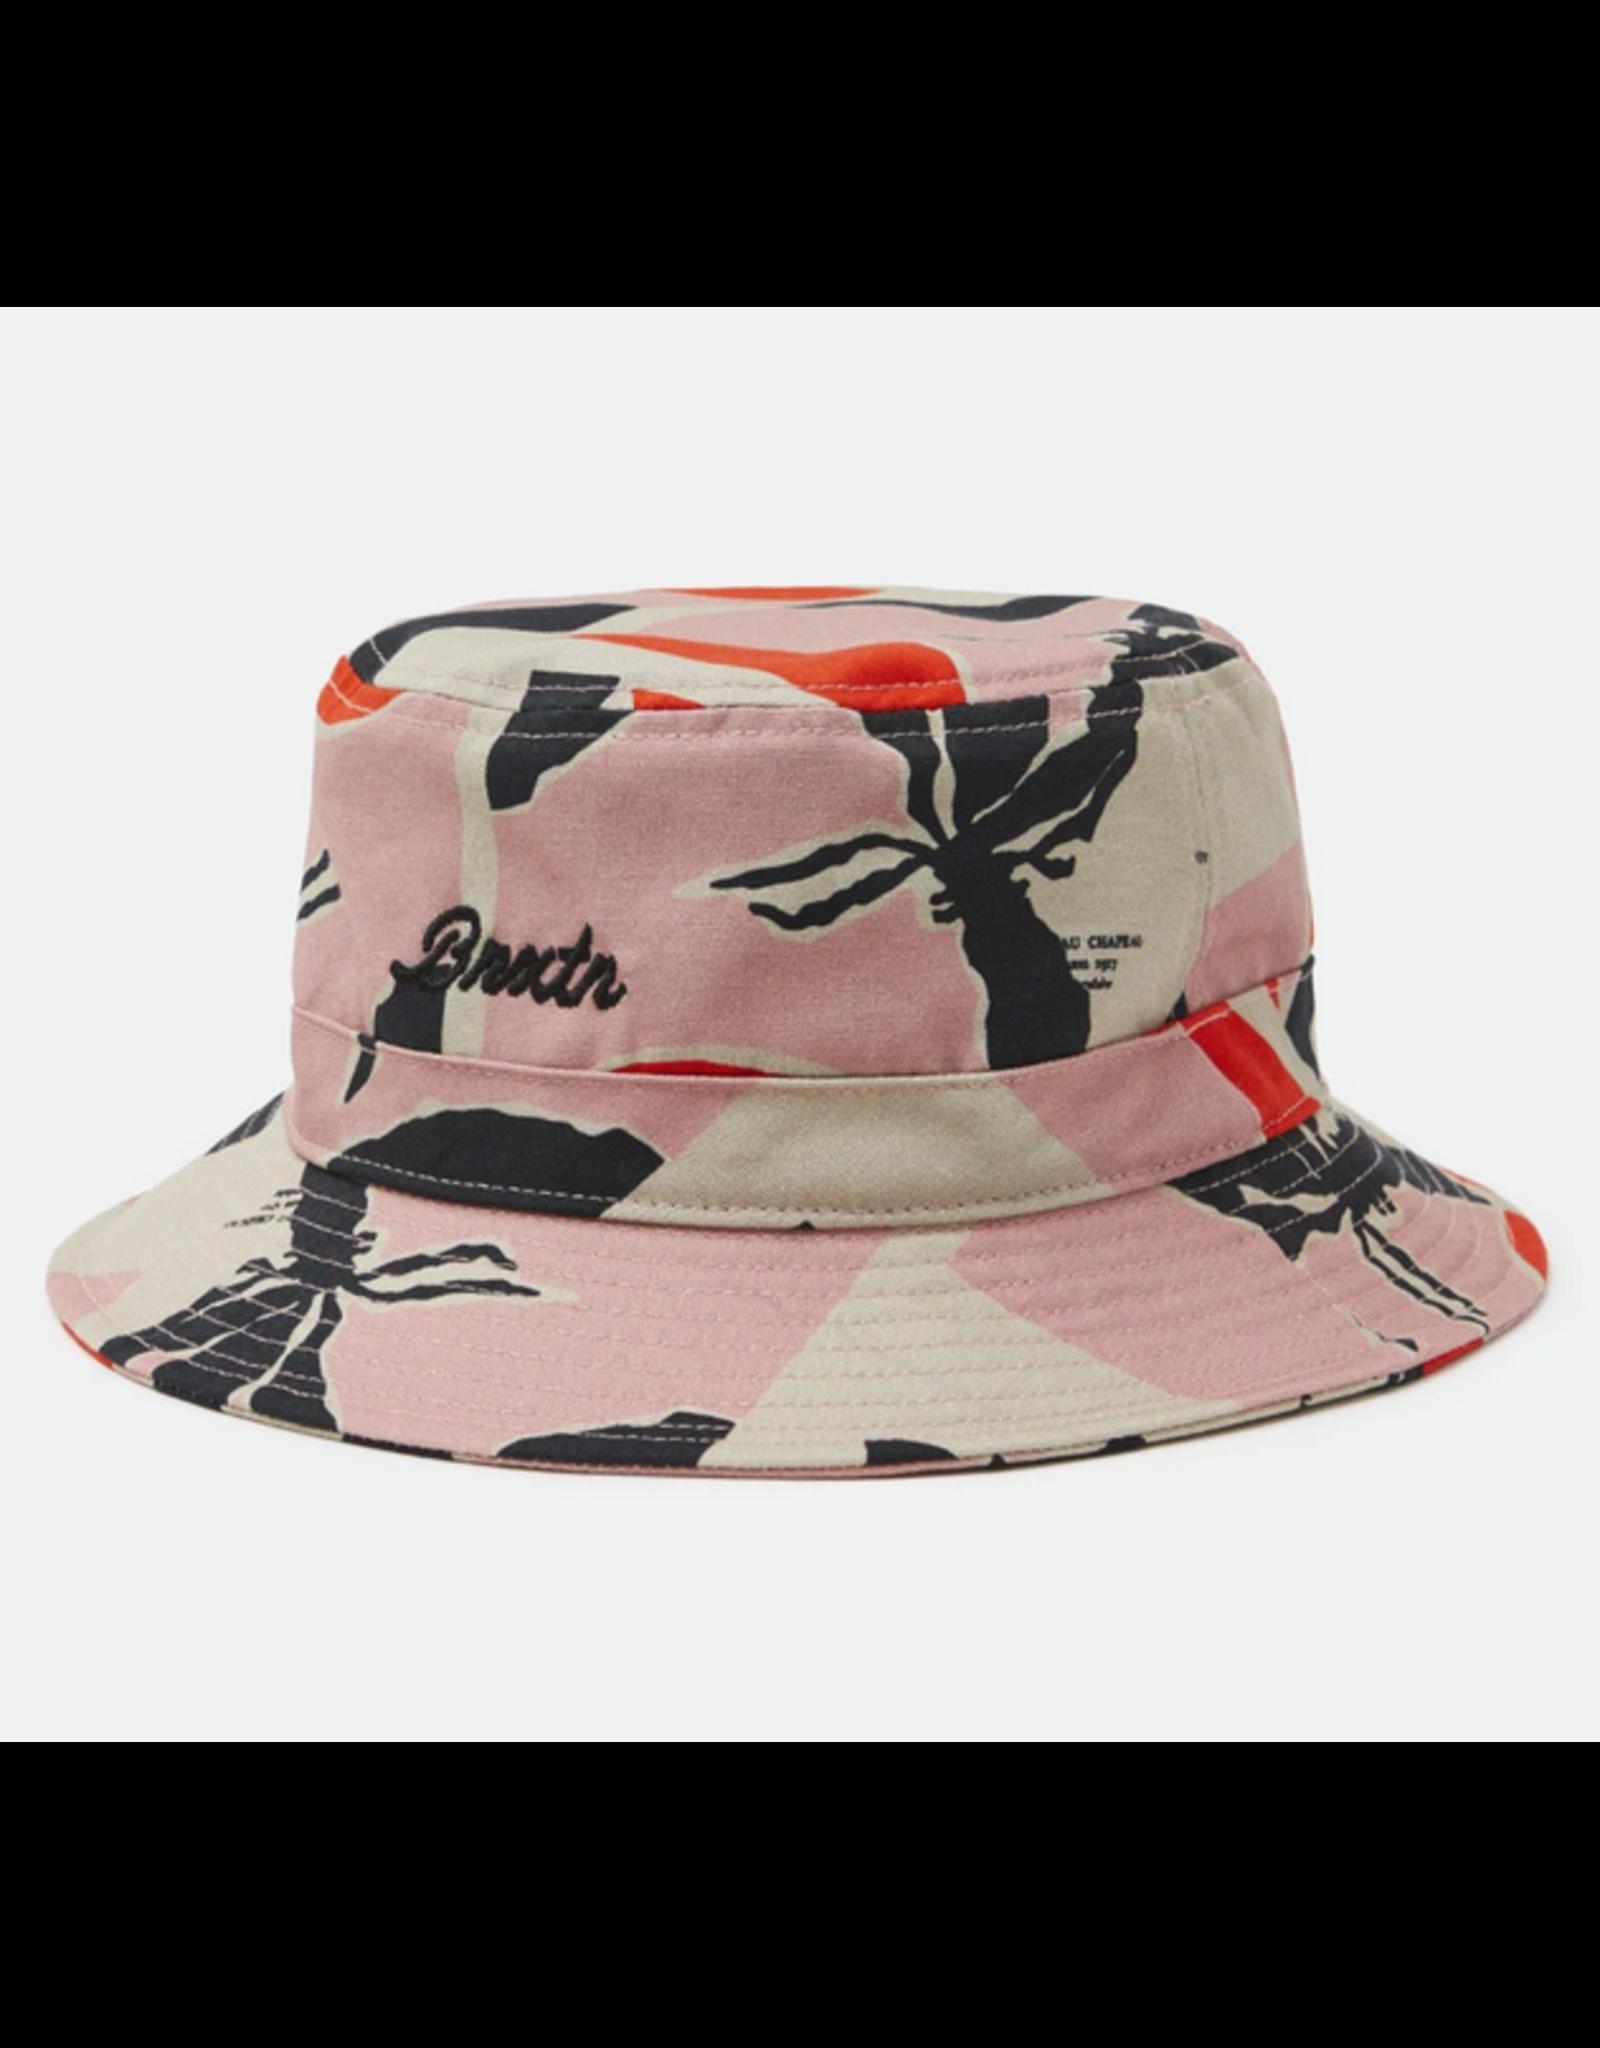 Brixton - Print Squishable Bucket Hat